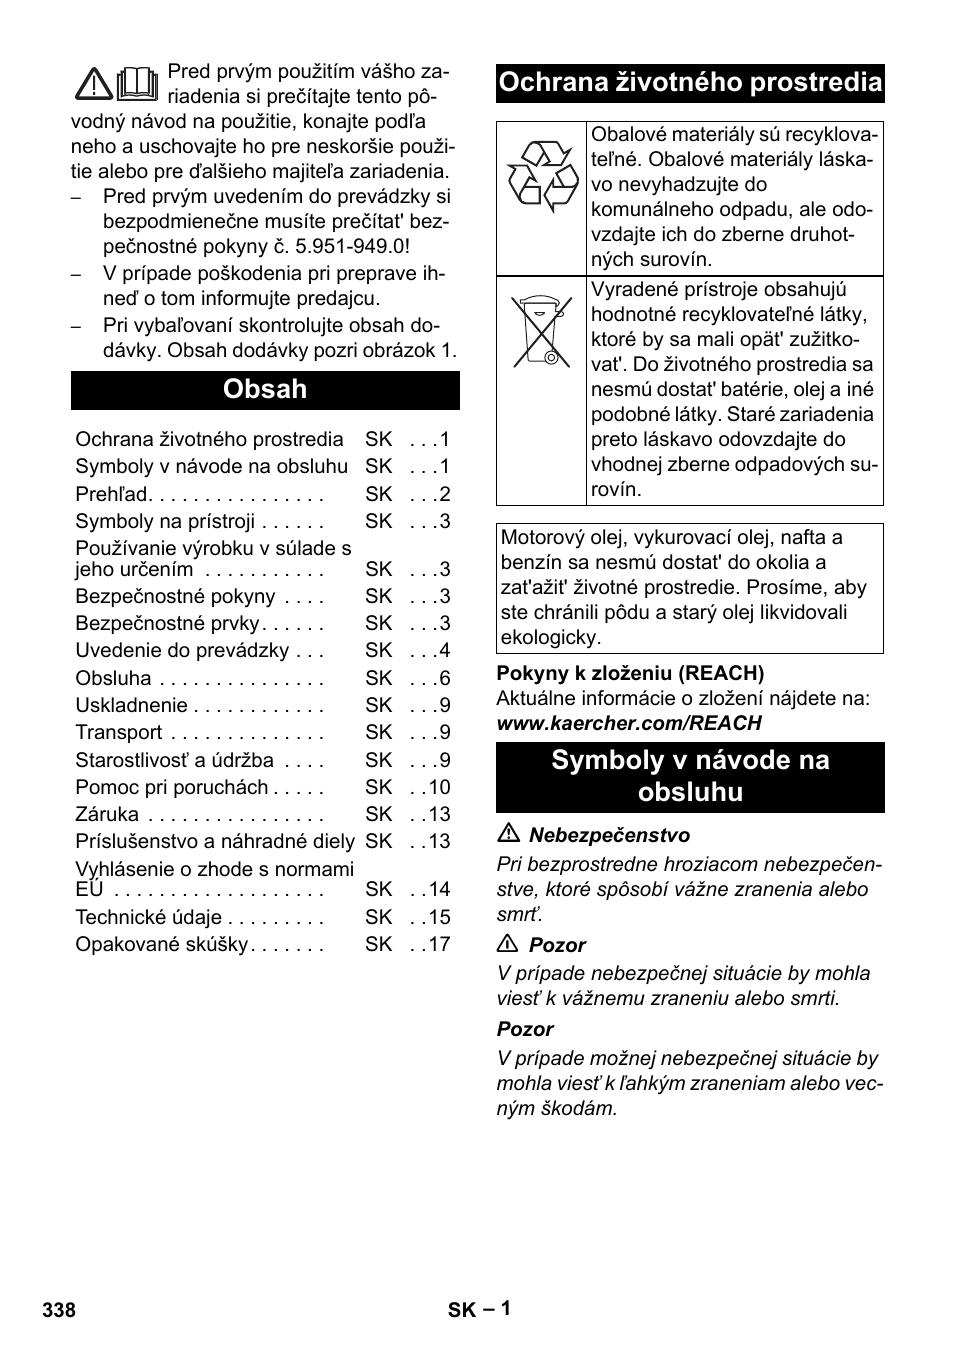 Karcher HDS 10-20 -4M CLASSIC EU-I User Manual | Page 338